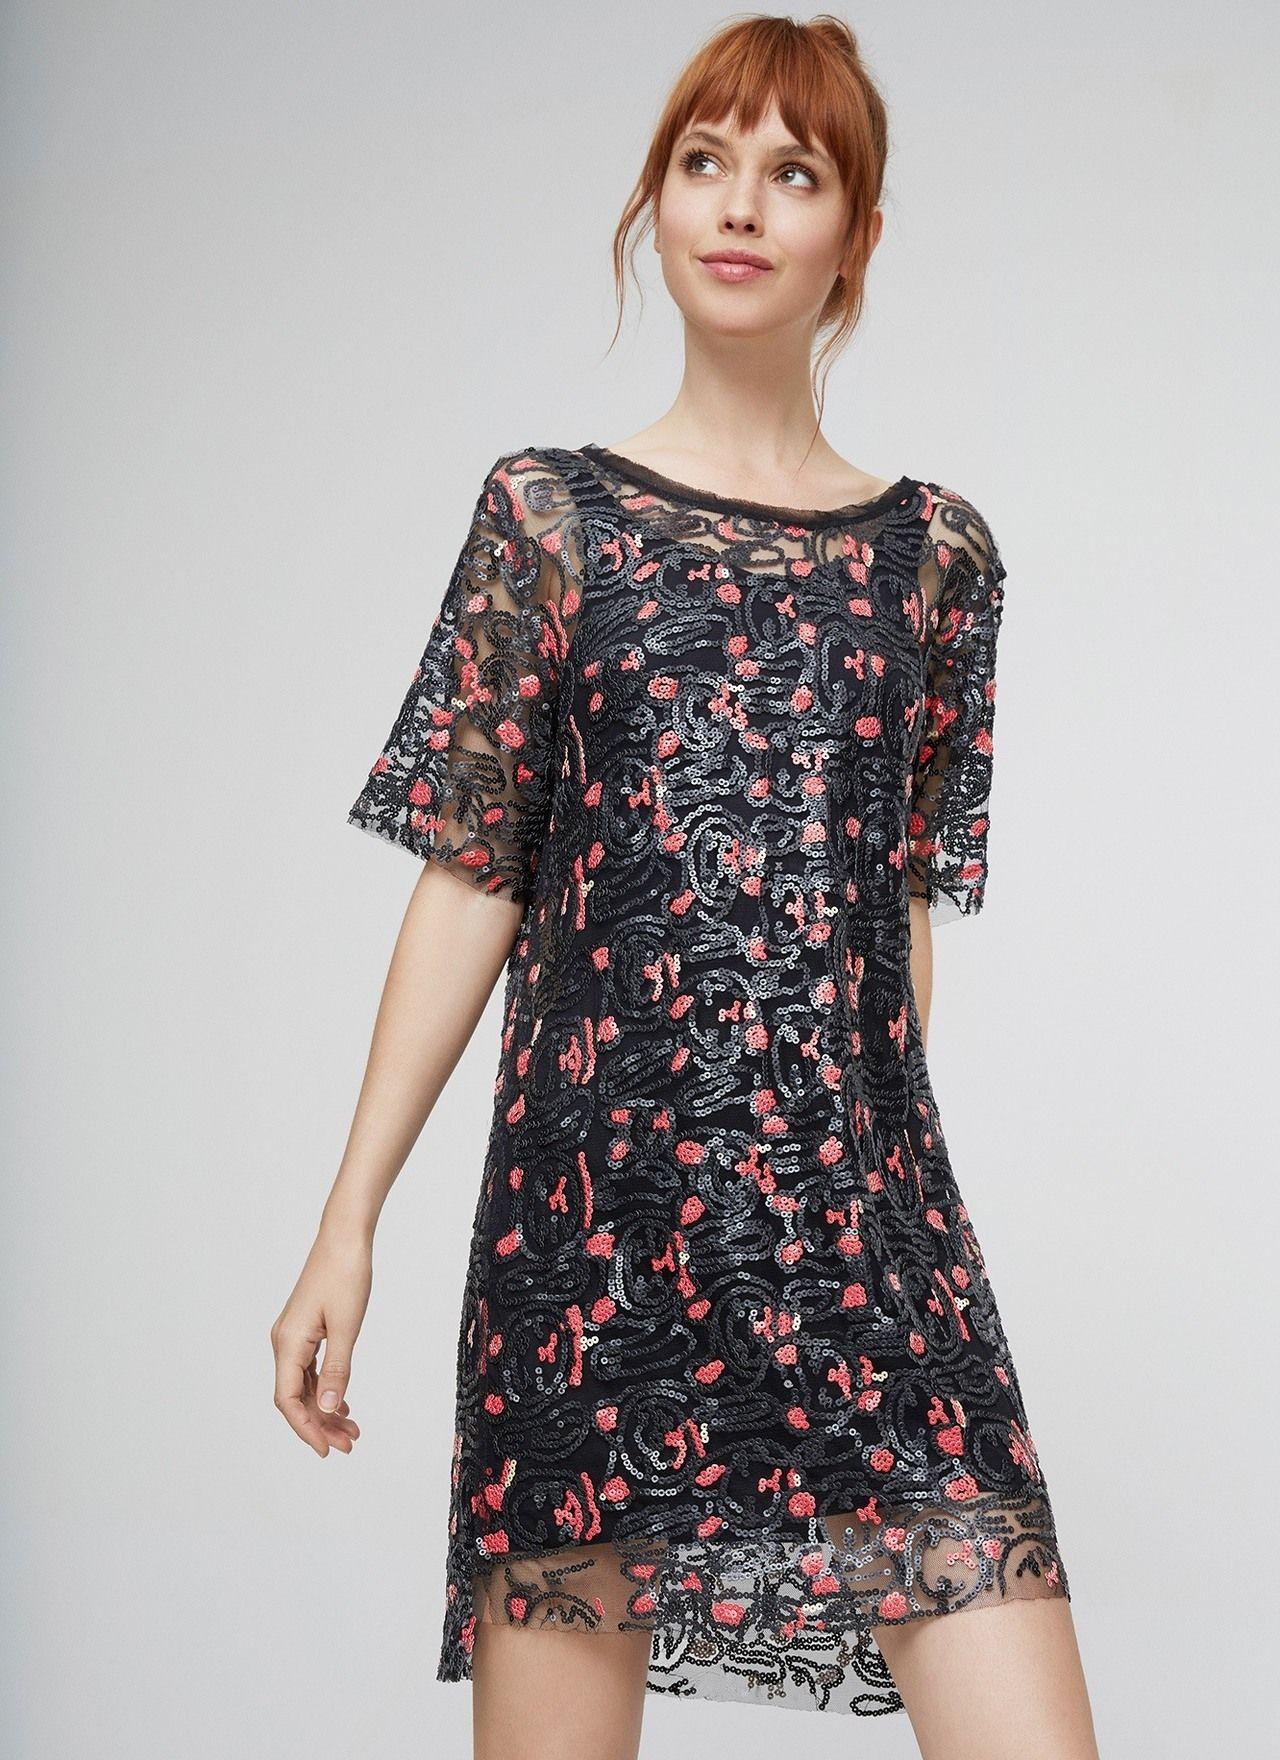 Vestido lentejuelas con transparencias colecci n for Adolfo dominguez outlet online